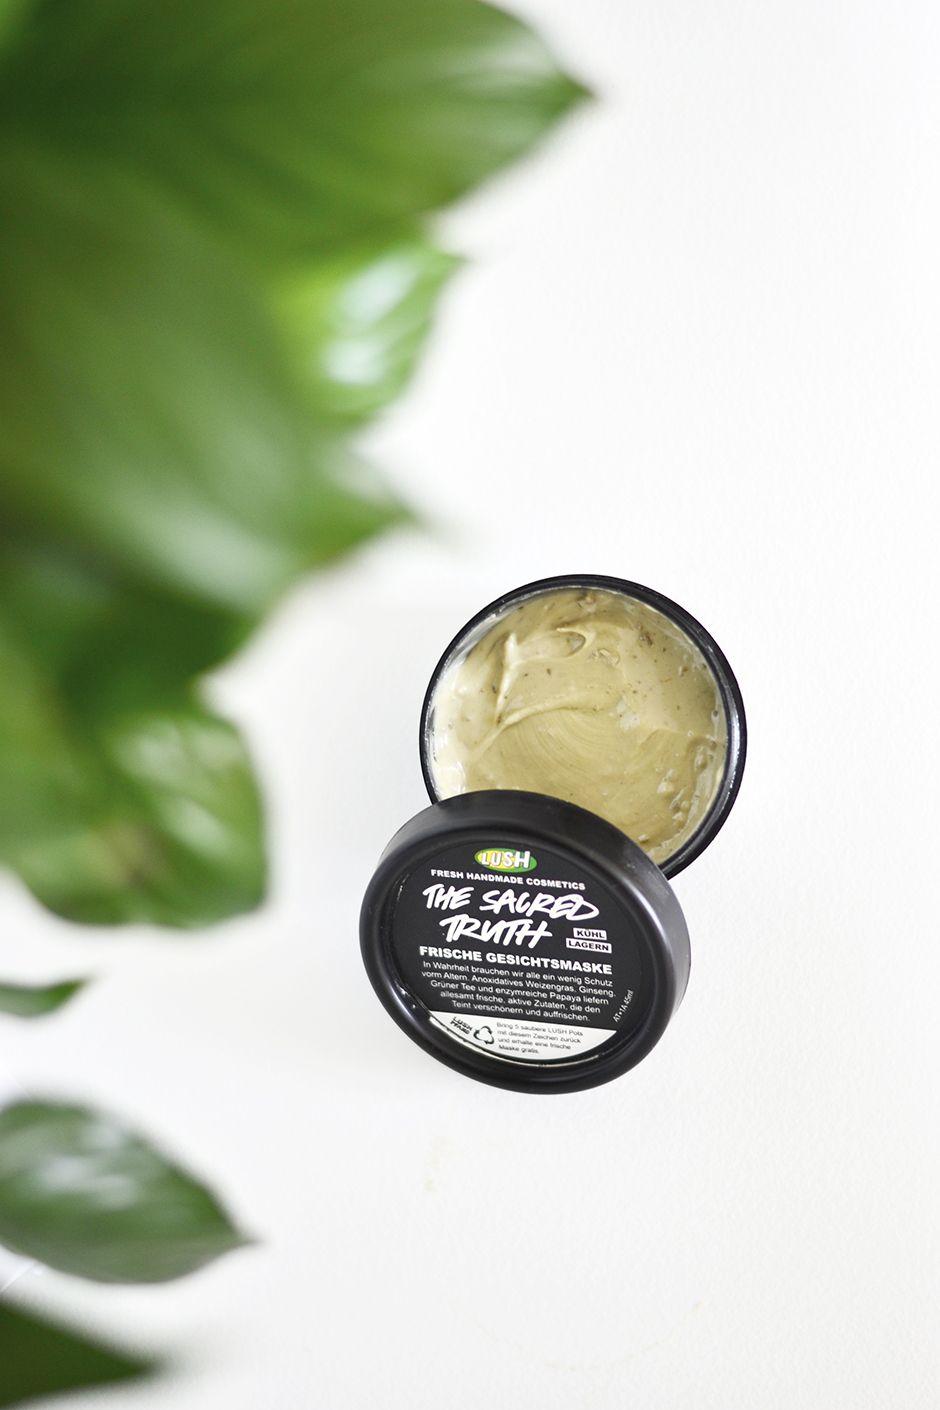 Viertel runde küchenschränke best facemask for dry skin  hair u beauty  pinterest  hair beauty